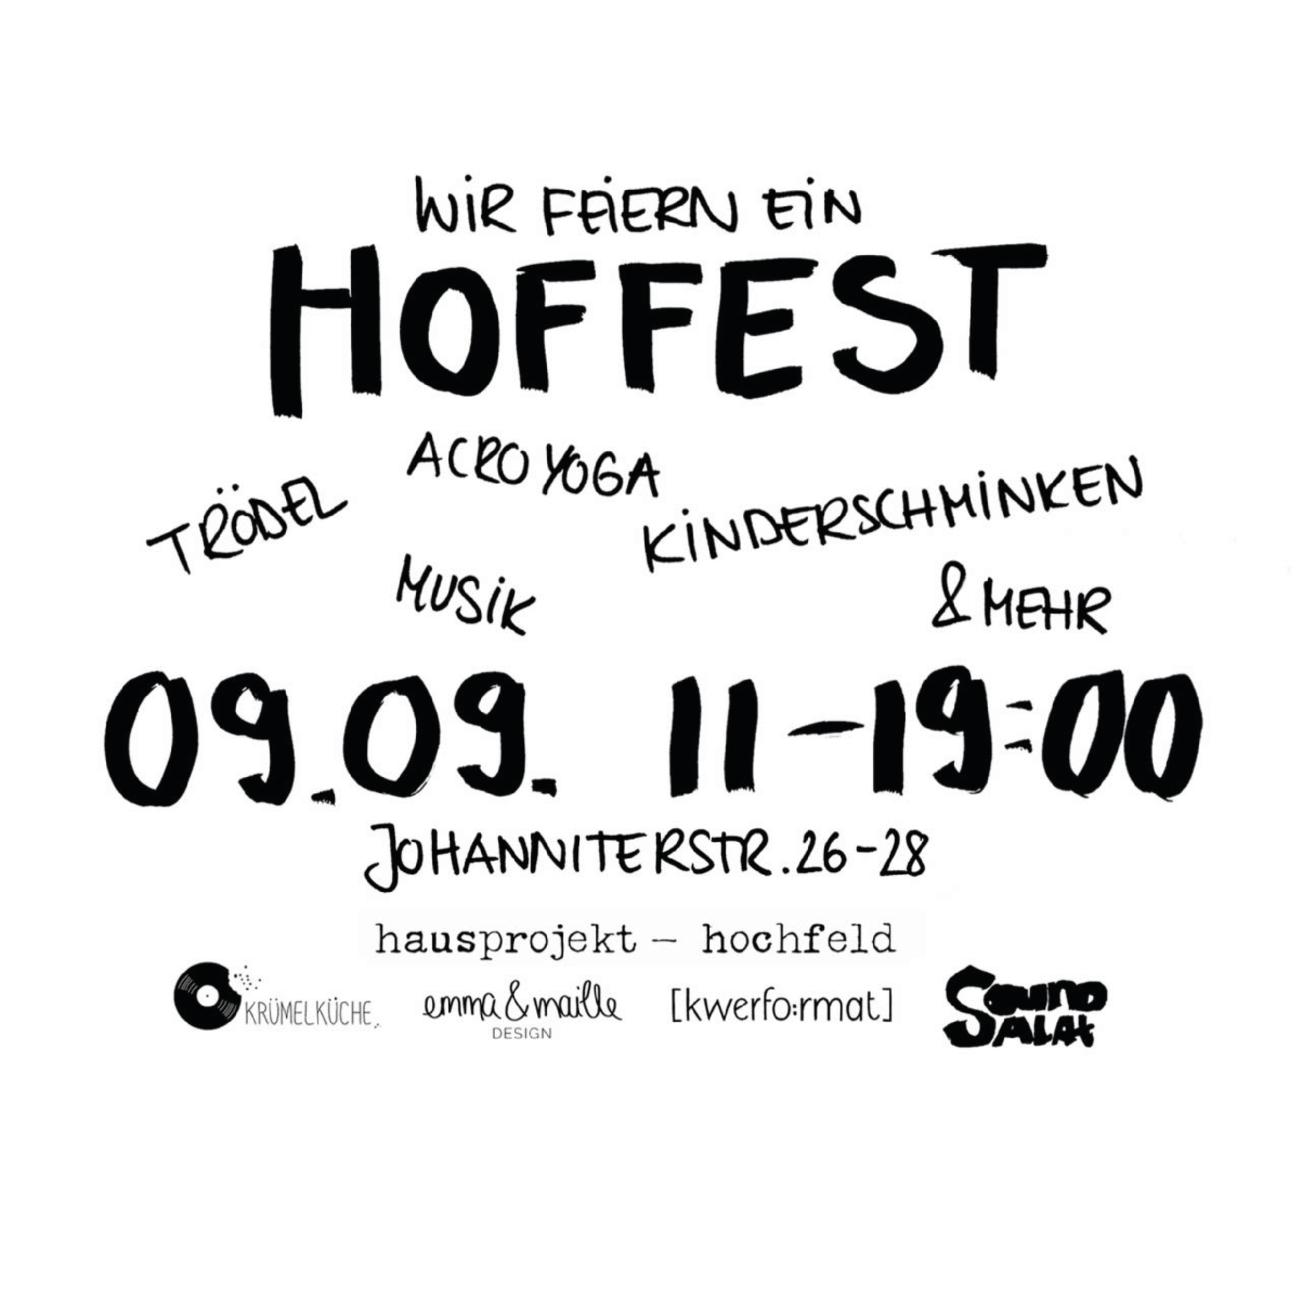 hoffest flyer